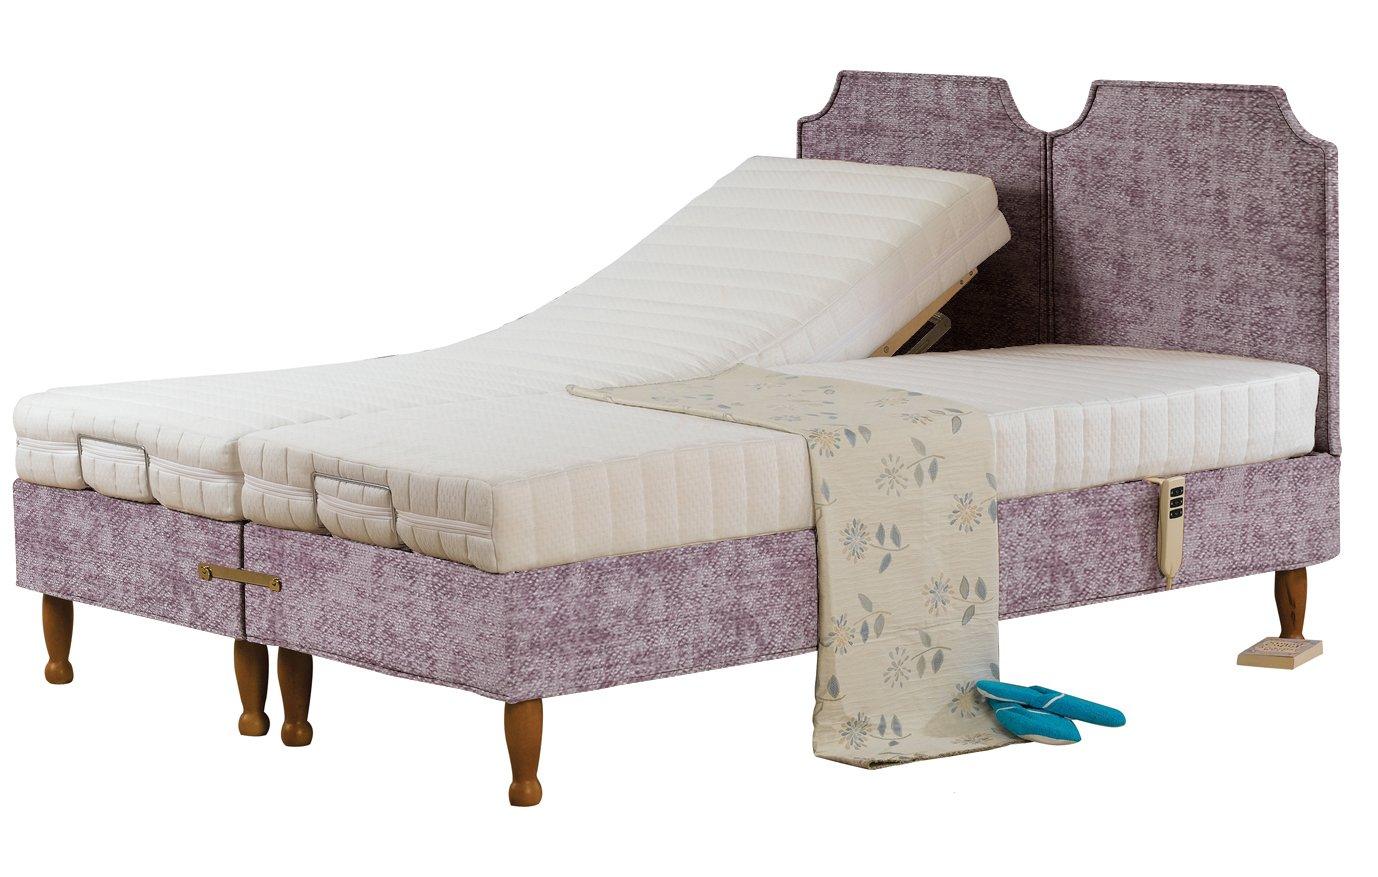 Furniture Expressions Sweet Dreams Fontwell - Base de Patas Ajustable, no almacena, 152 cm, tamaño King - Lavanda: Amazon.es: Hogar